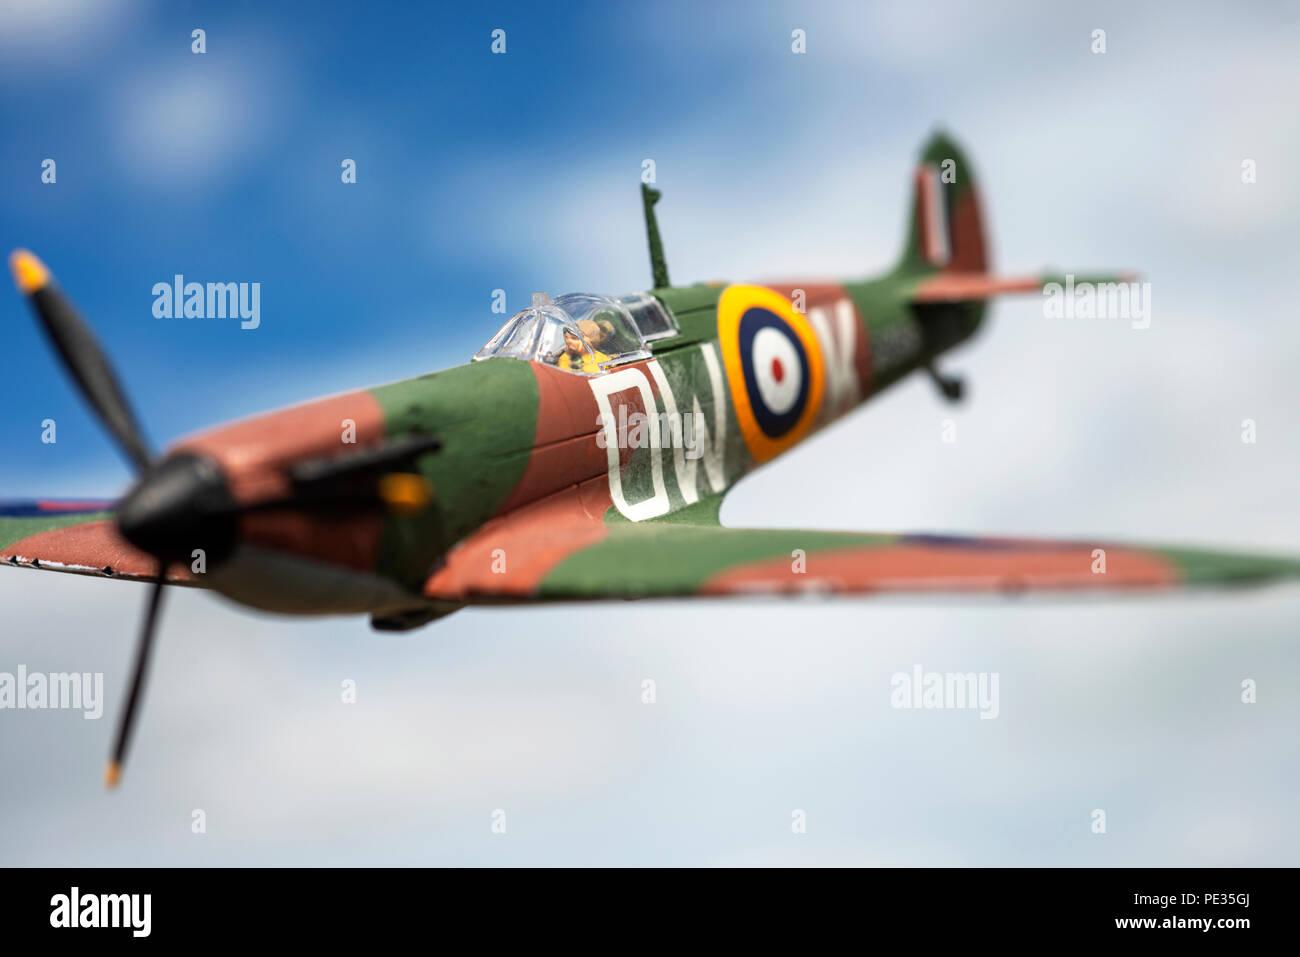 Airfix model Spitfire - Stock Image